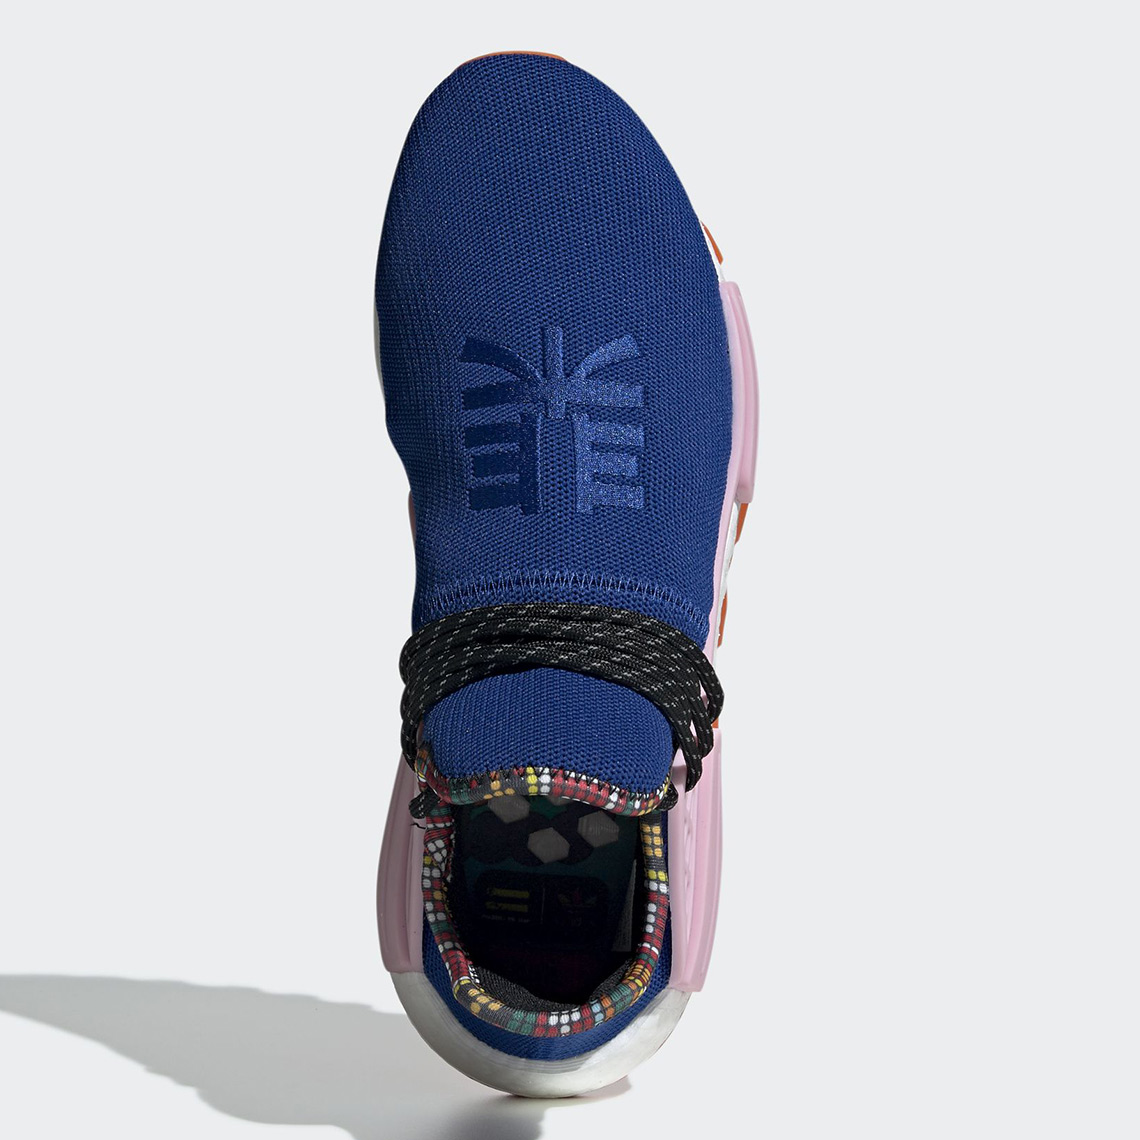 c51bf50f1 Pharrell adidas NMD Hu Inspiration Pack Photos + Release Info ...